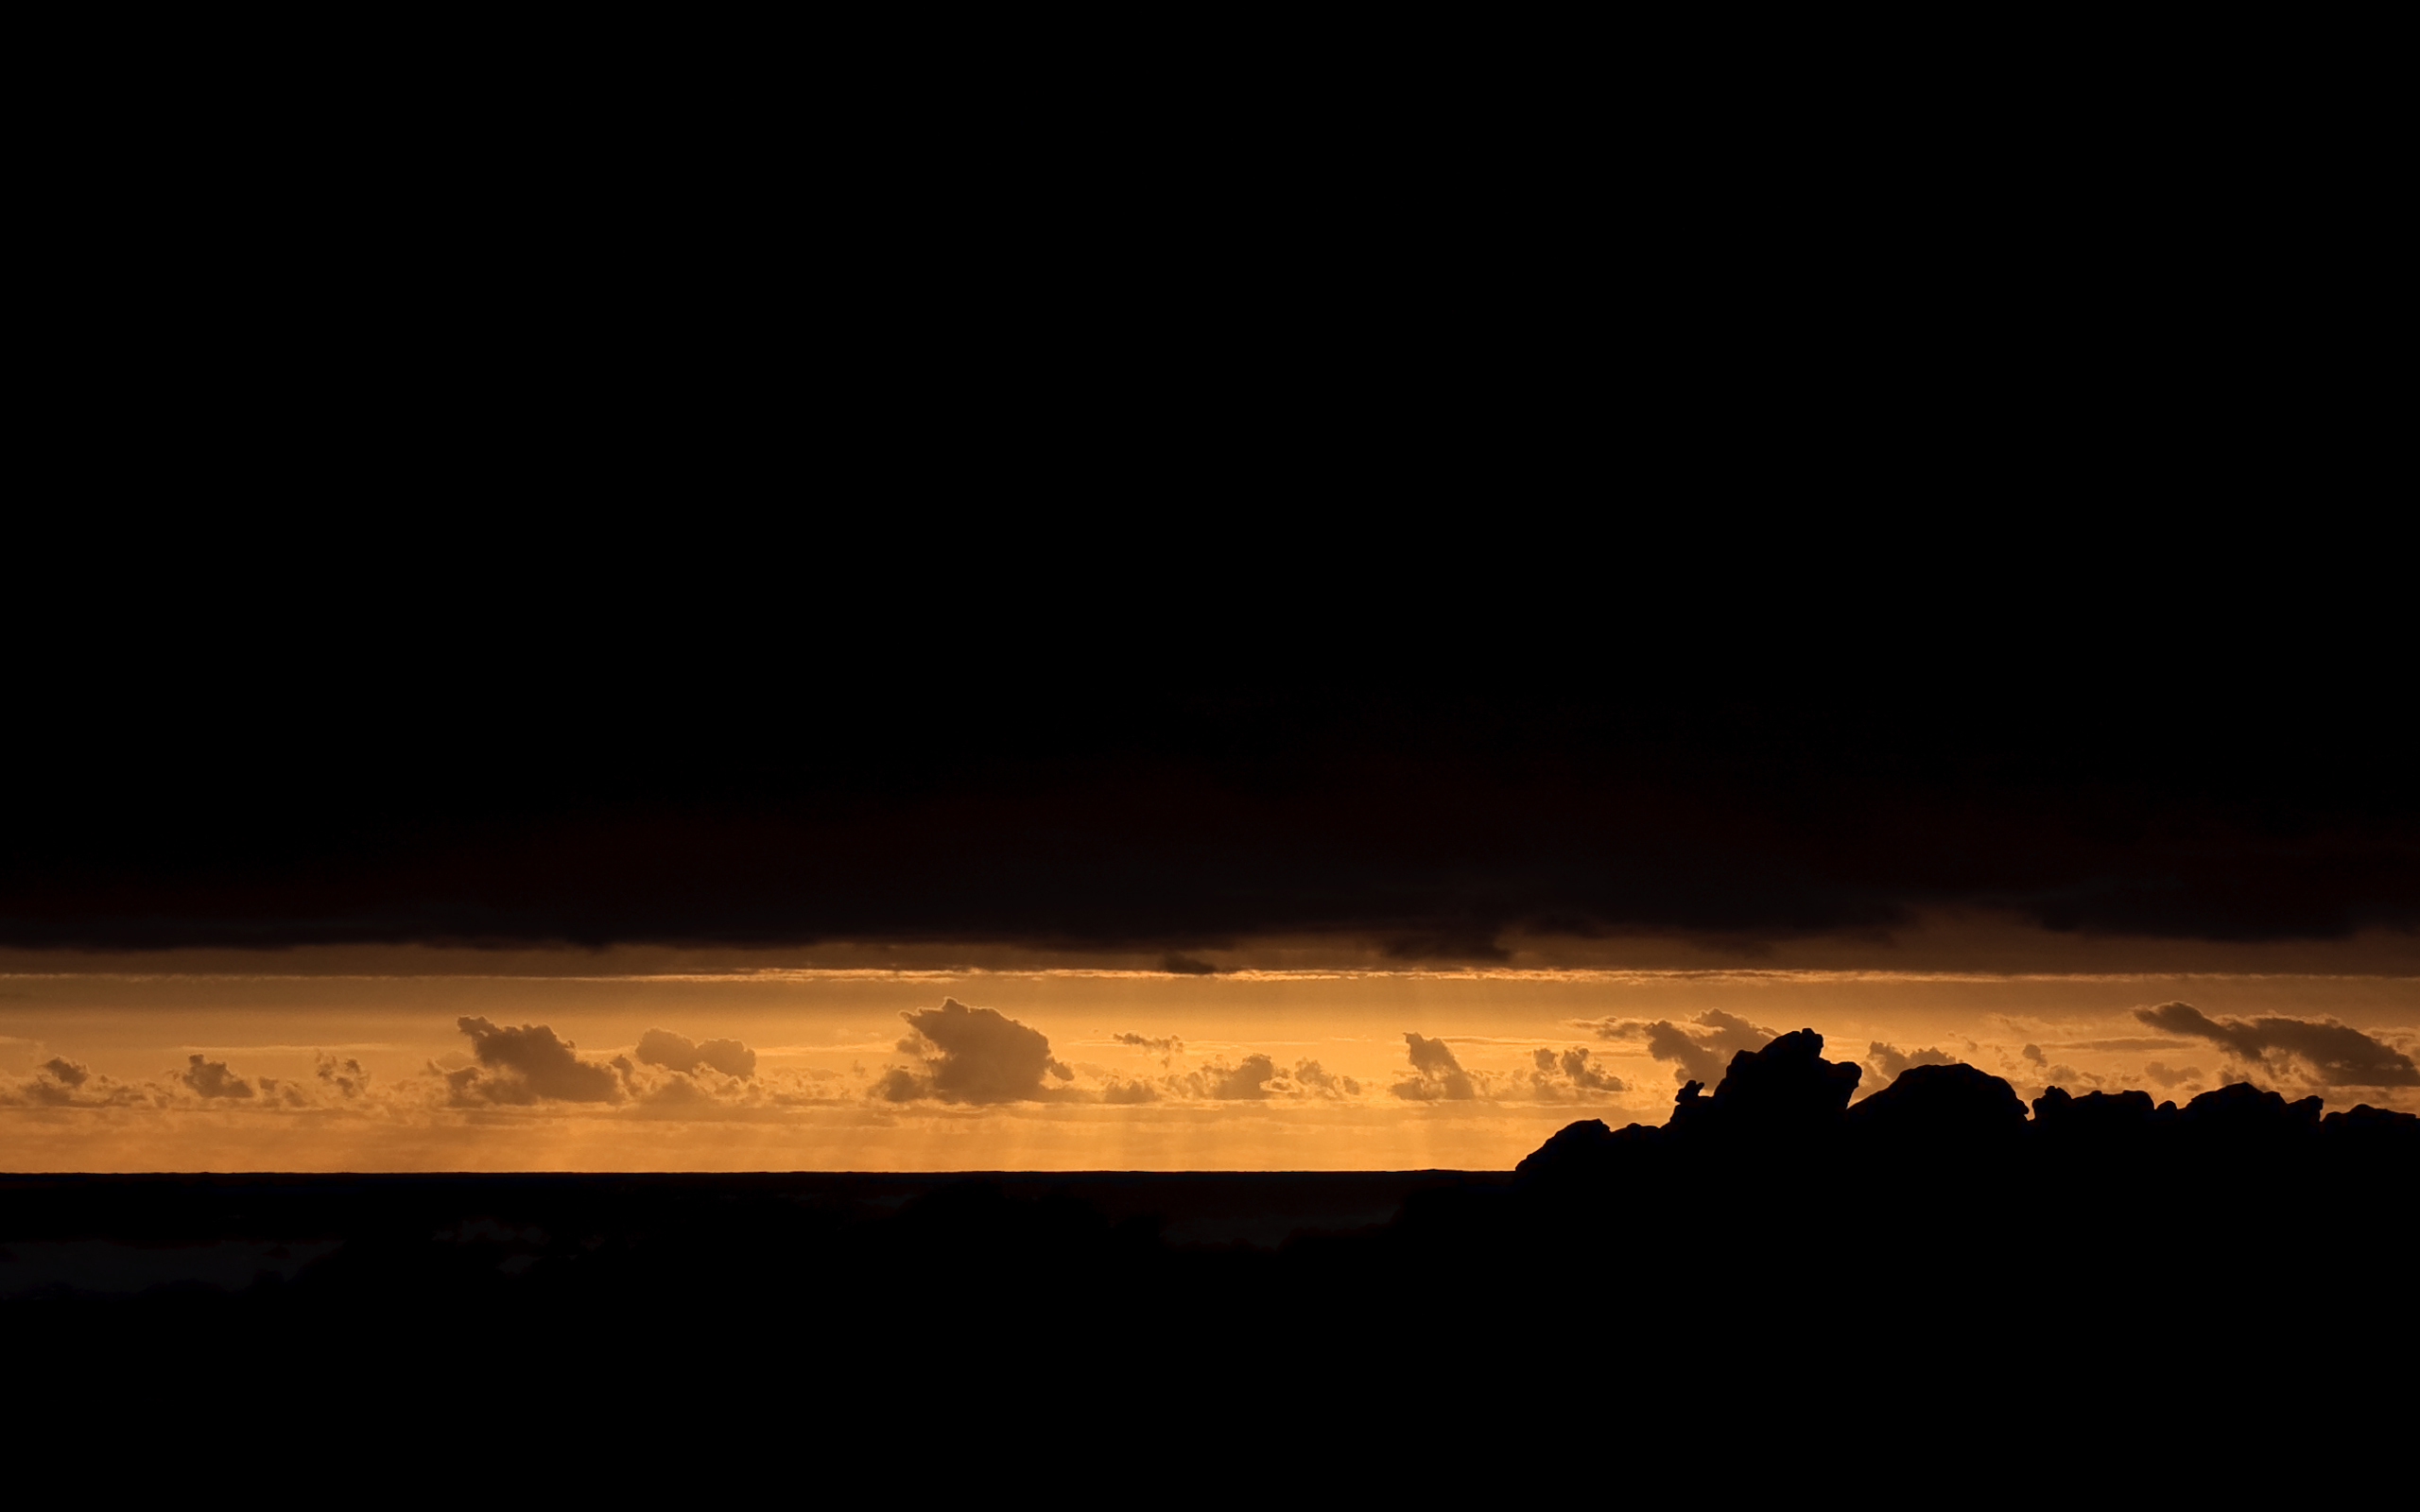 Картинка: Небо, облака, силуэт, горизонт